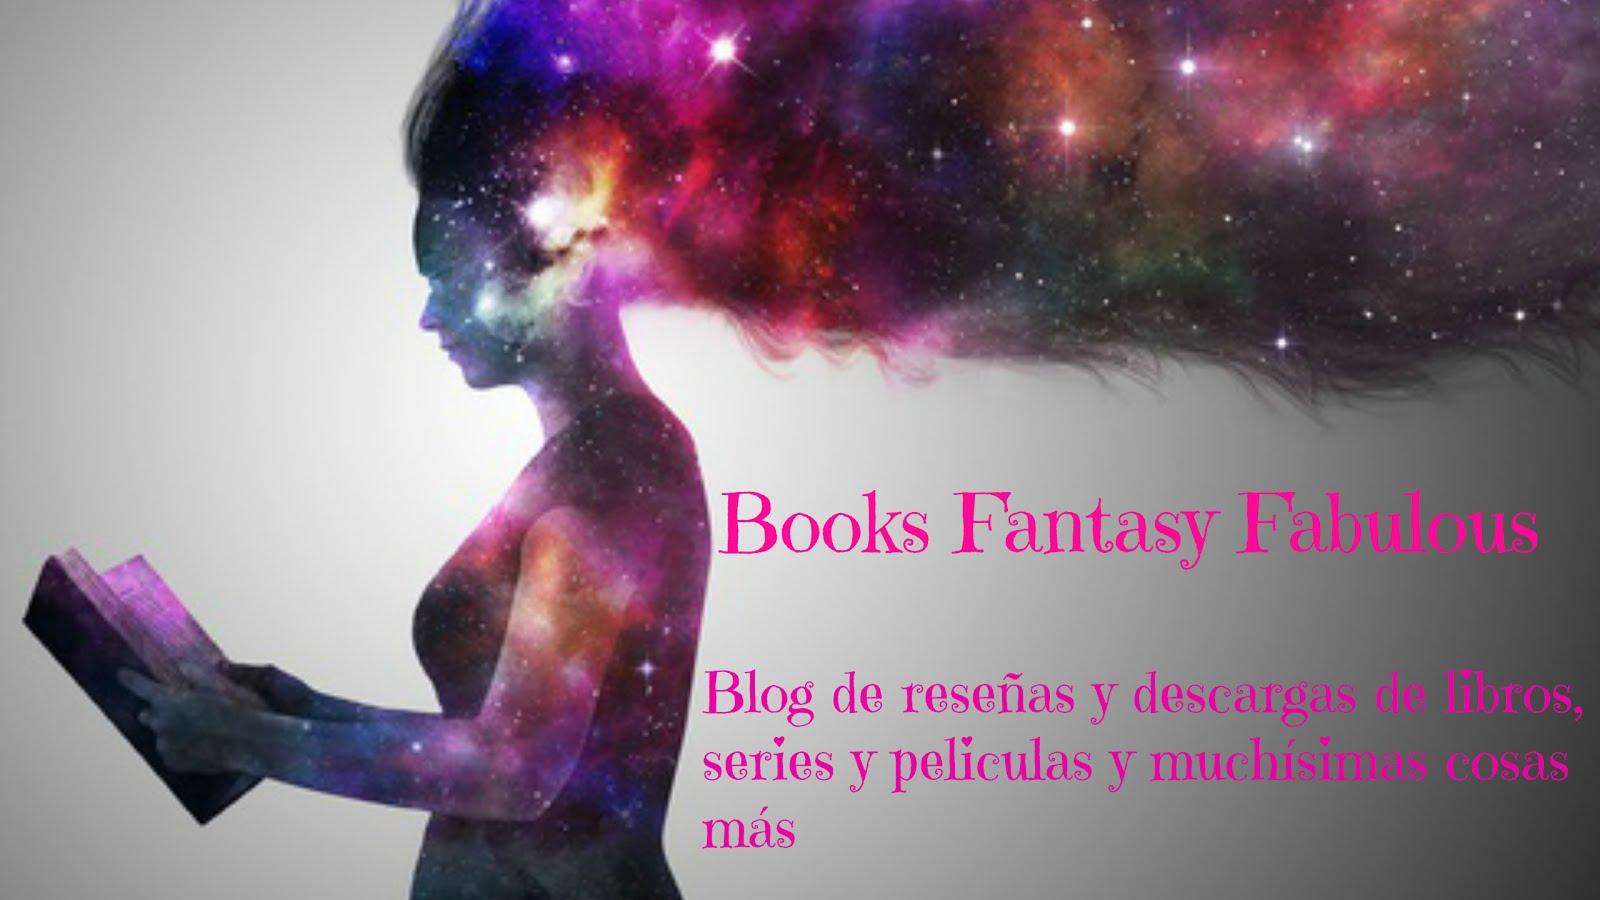 Books Fantasy Fabulous